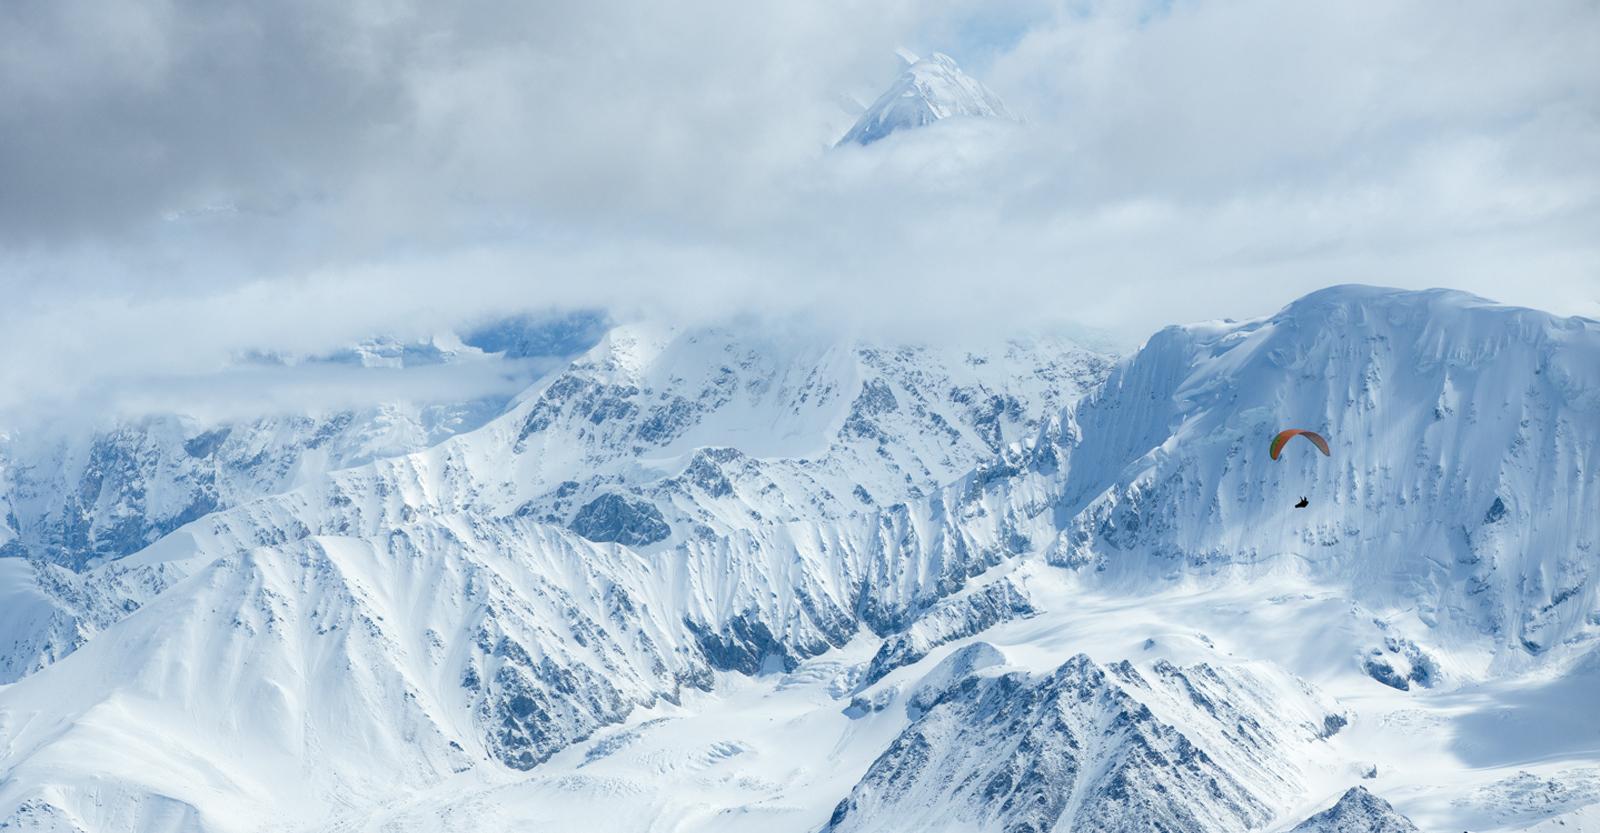 ALASKA MOUNTAINS WINTER SNOW AIRPLANE TRAVEL SOAR Mens Black Hoodie